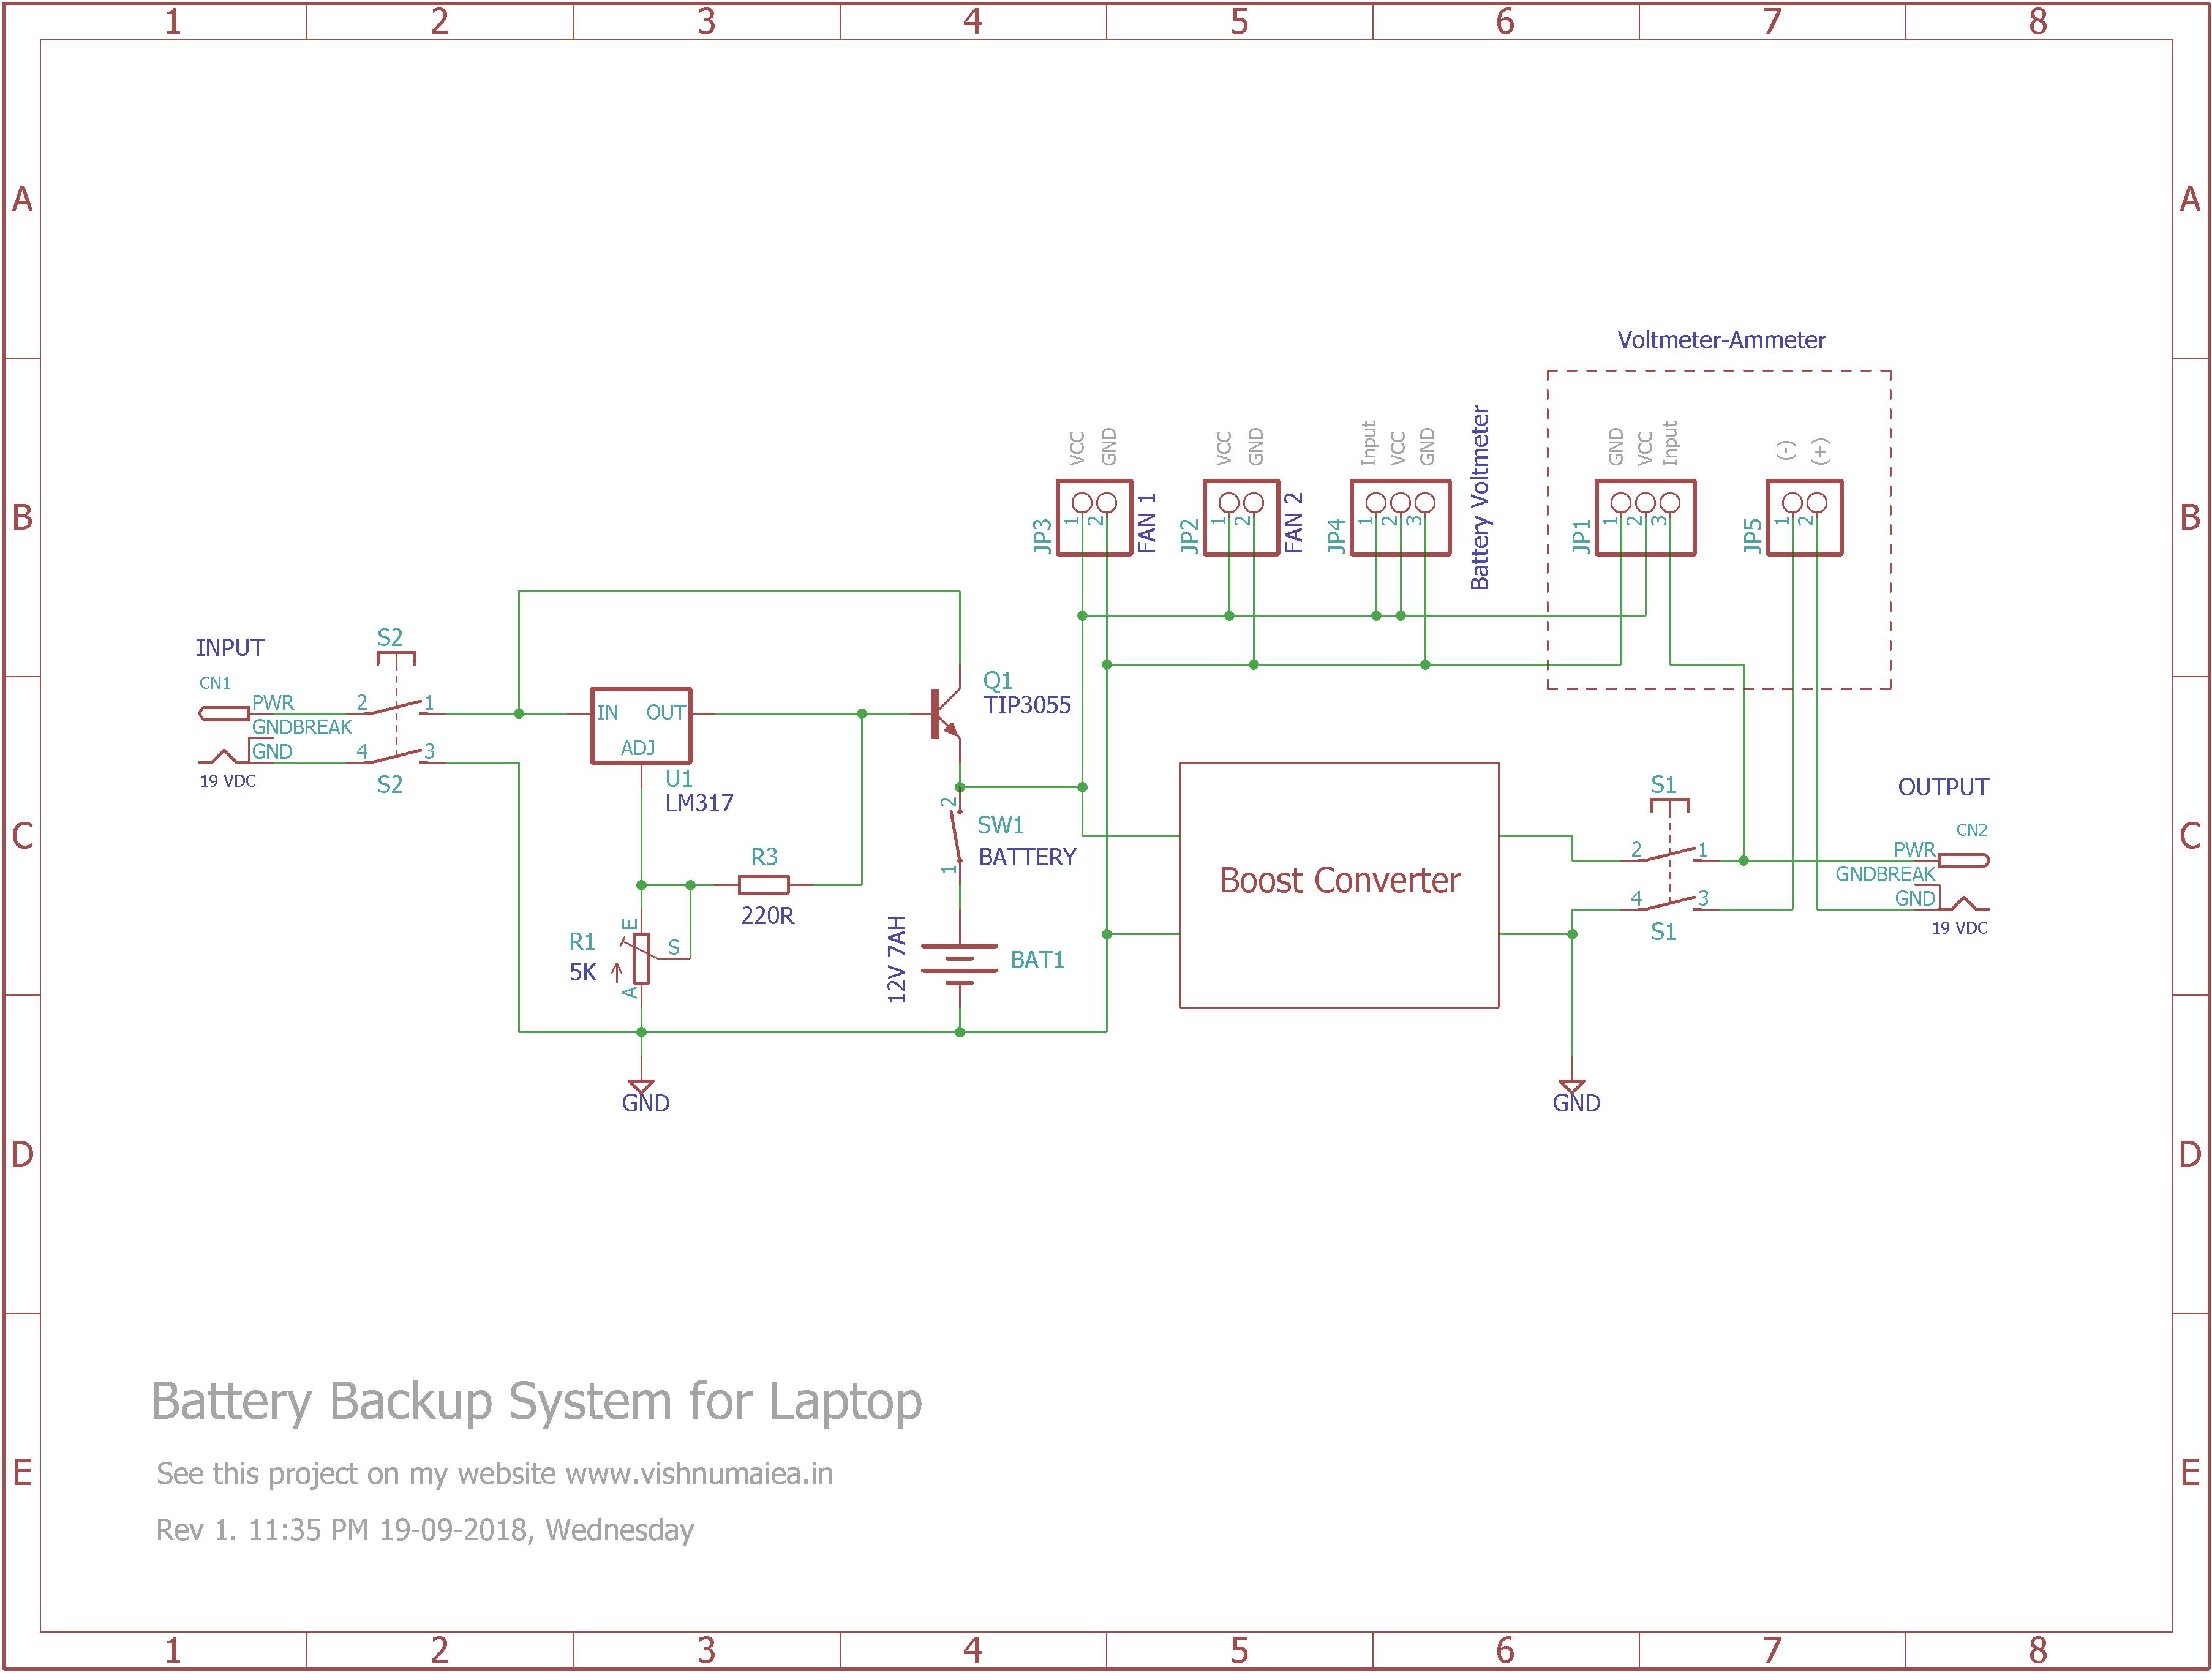 Laptop Battery backup System Schematic